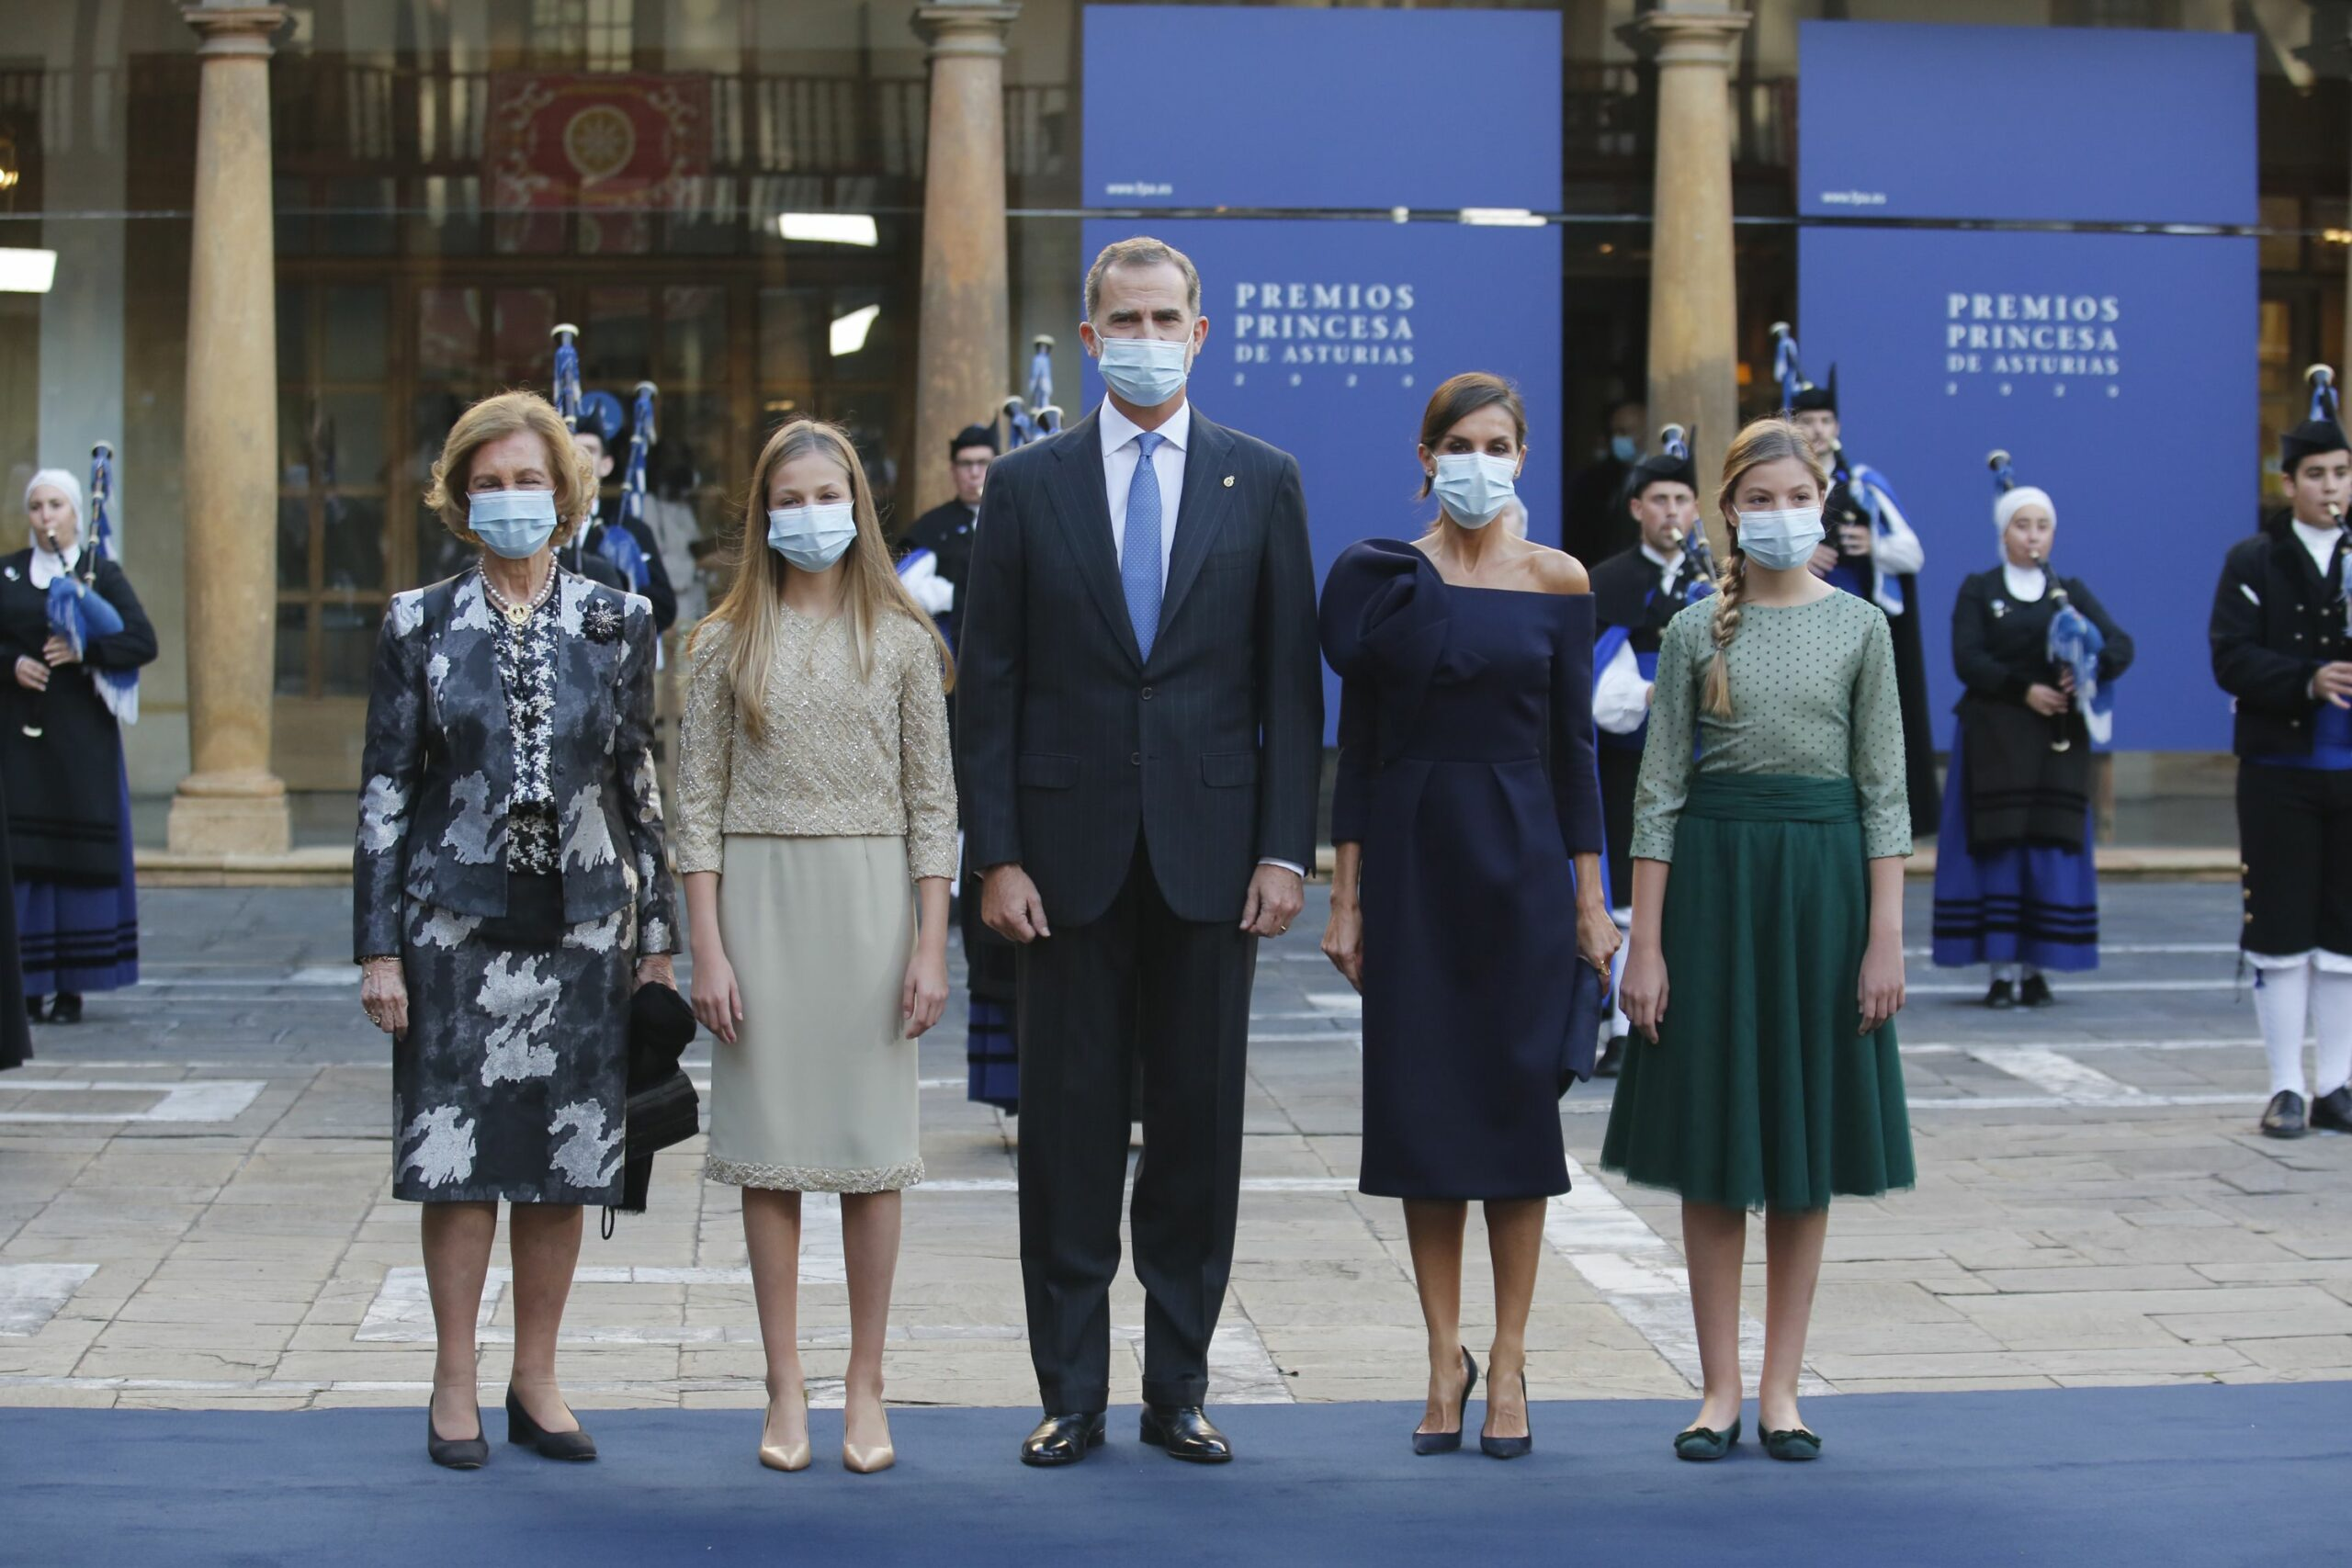 La família reial en els premis Princesa d'Astúries   Europa Press